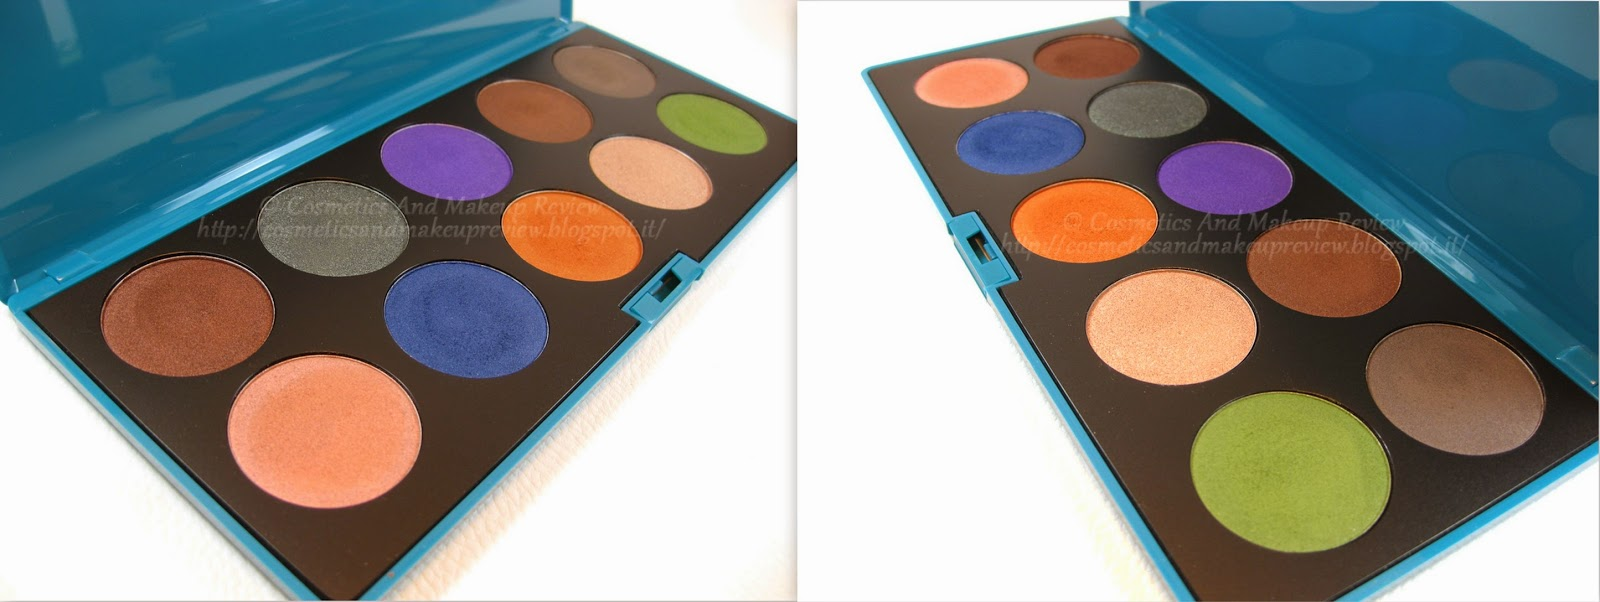 Neve Cosmetics - Makeup Delight Palette - descrizione